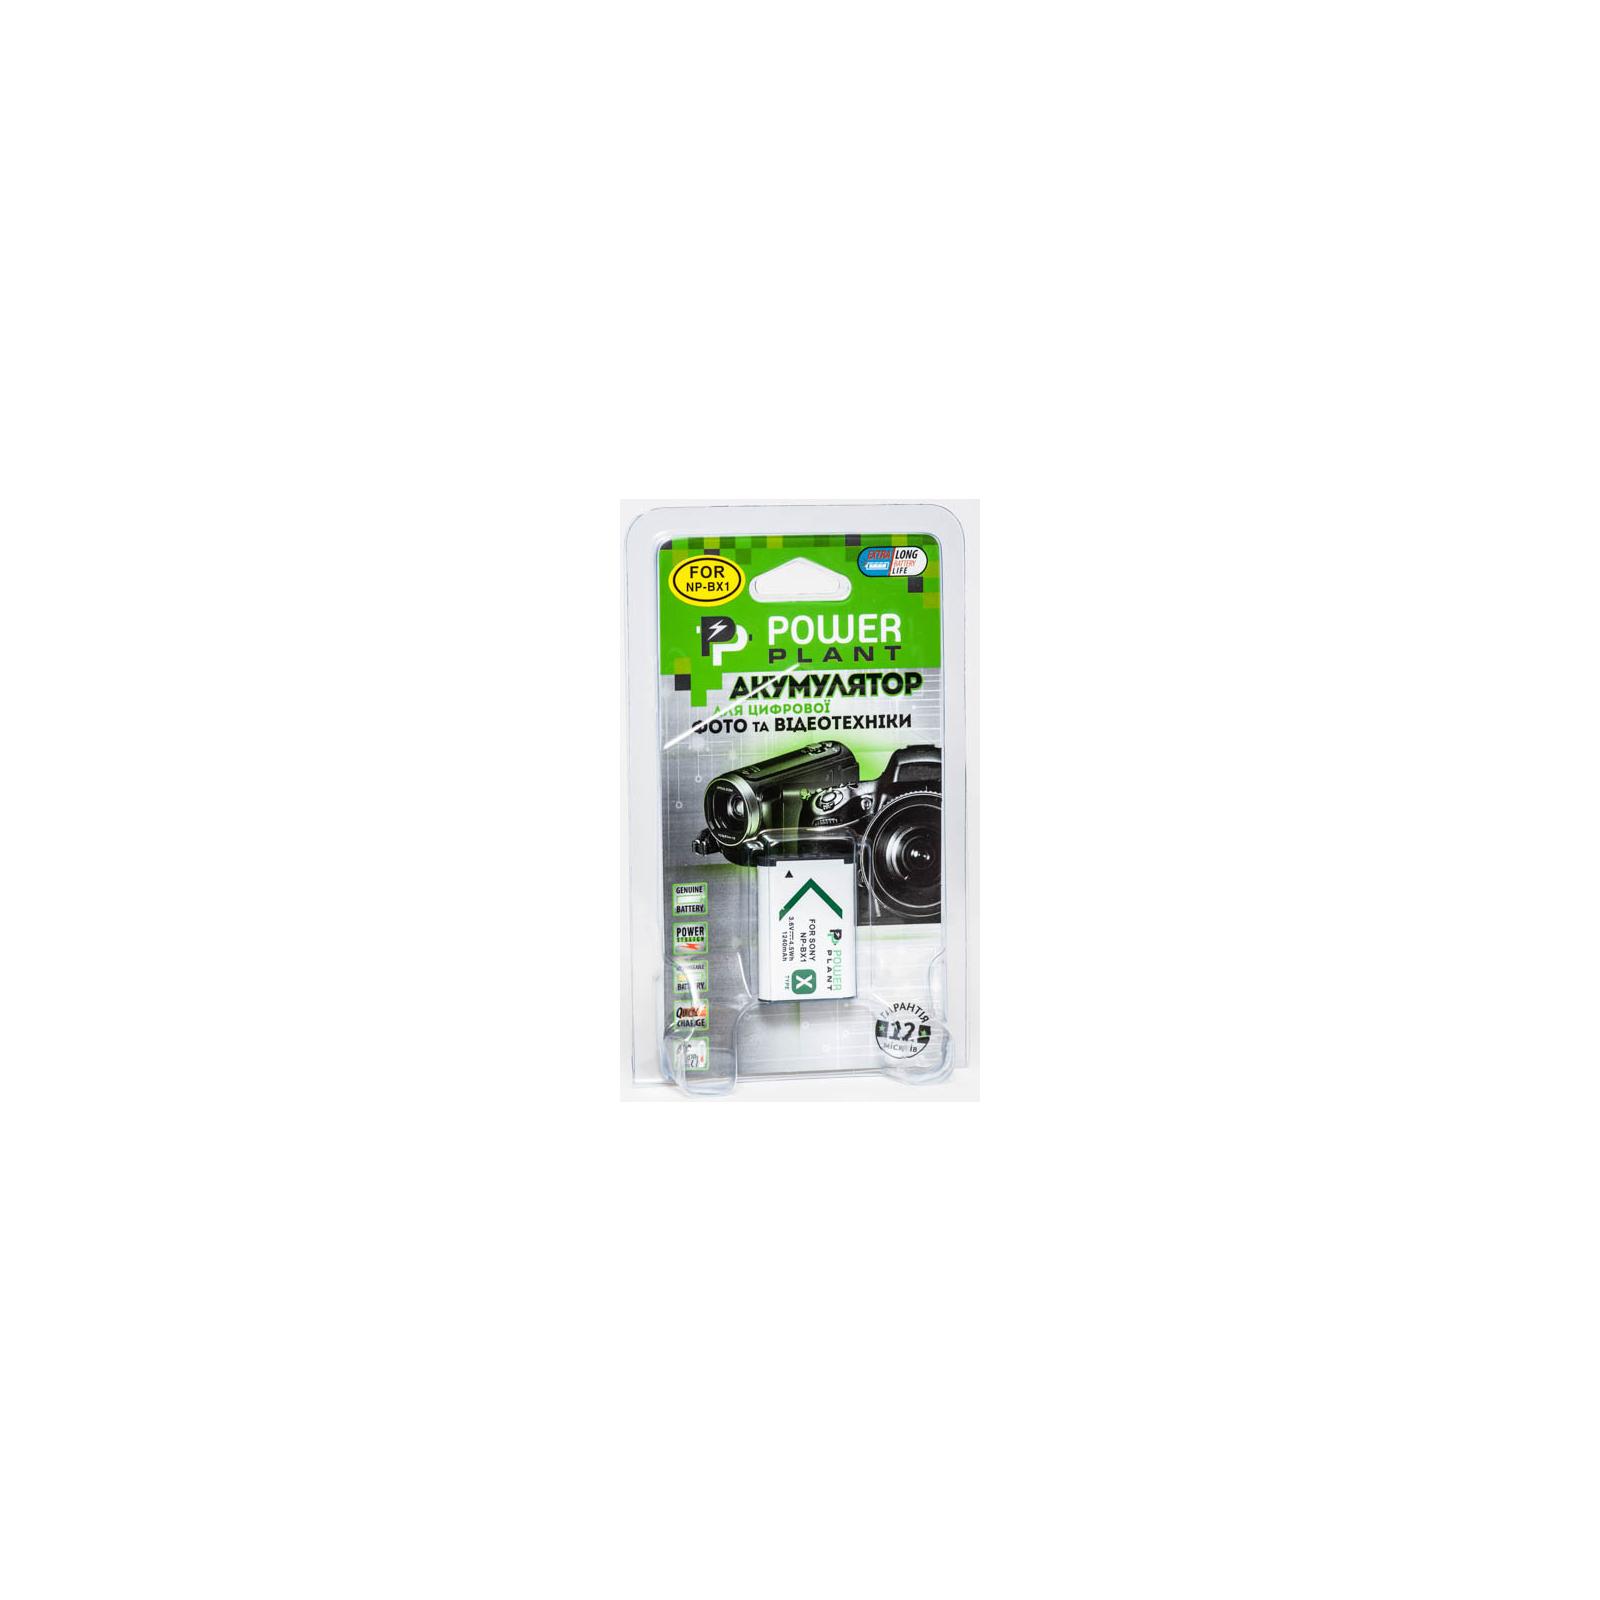 Аккумулятор к фото/видео PowerPlant Sony NP-BX1 (DV00DV1308) изображение 3